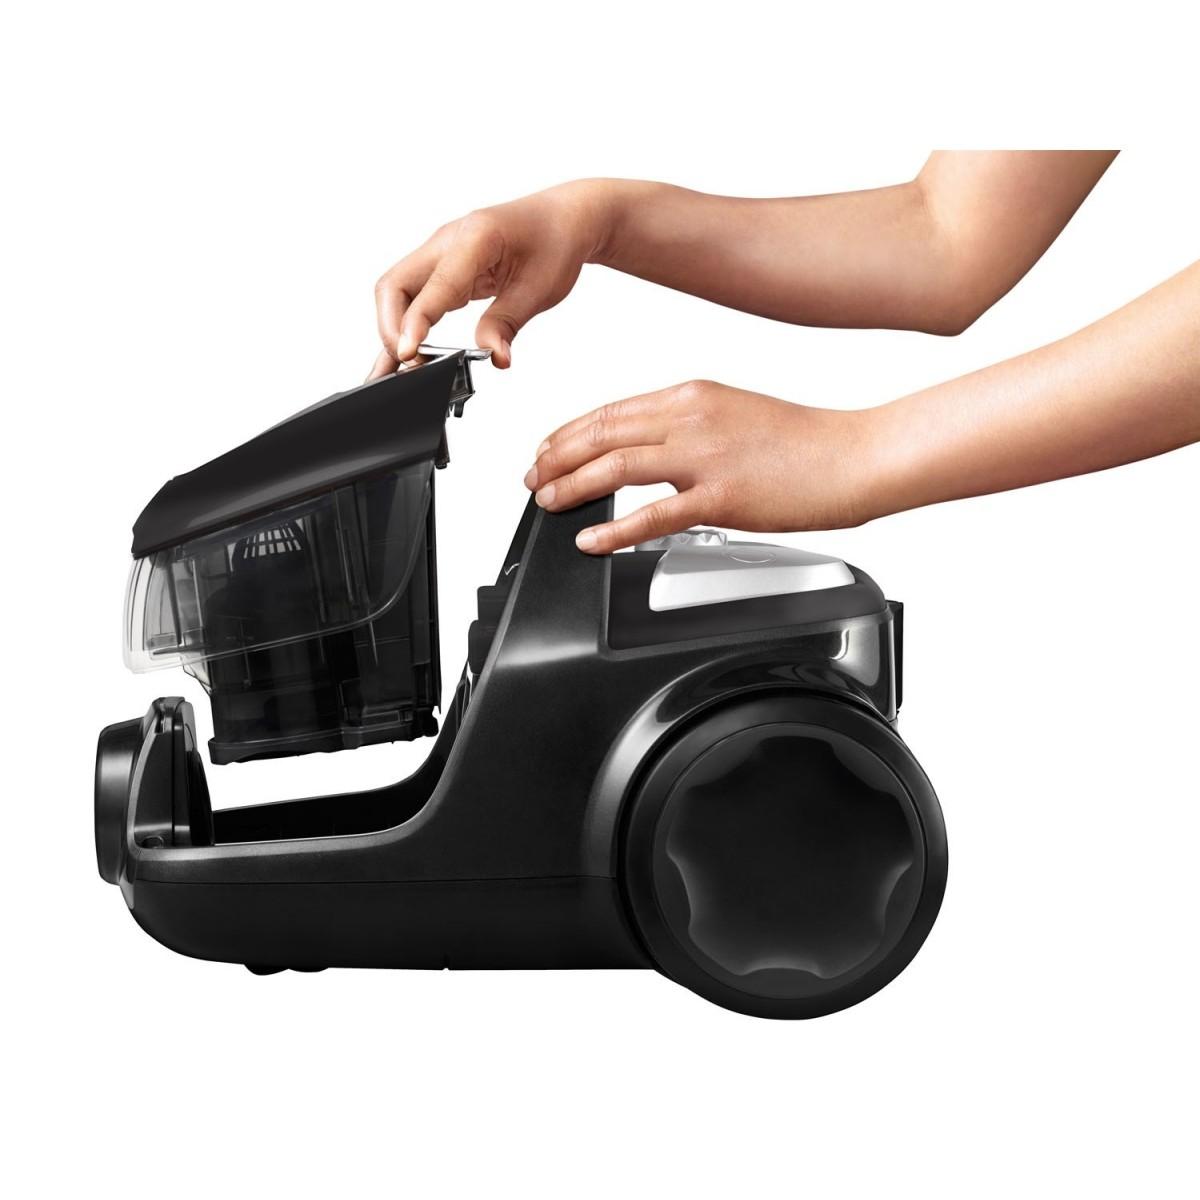 Aspirador de Pó 1,6l 1600w Easybox - Electrolux